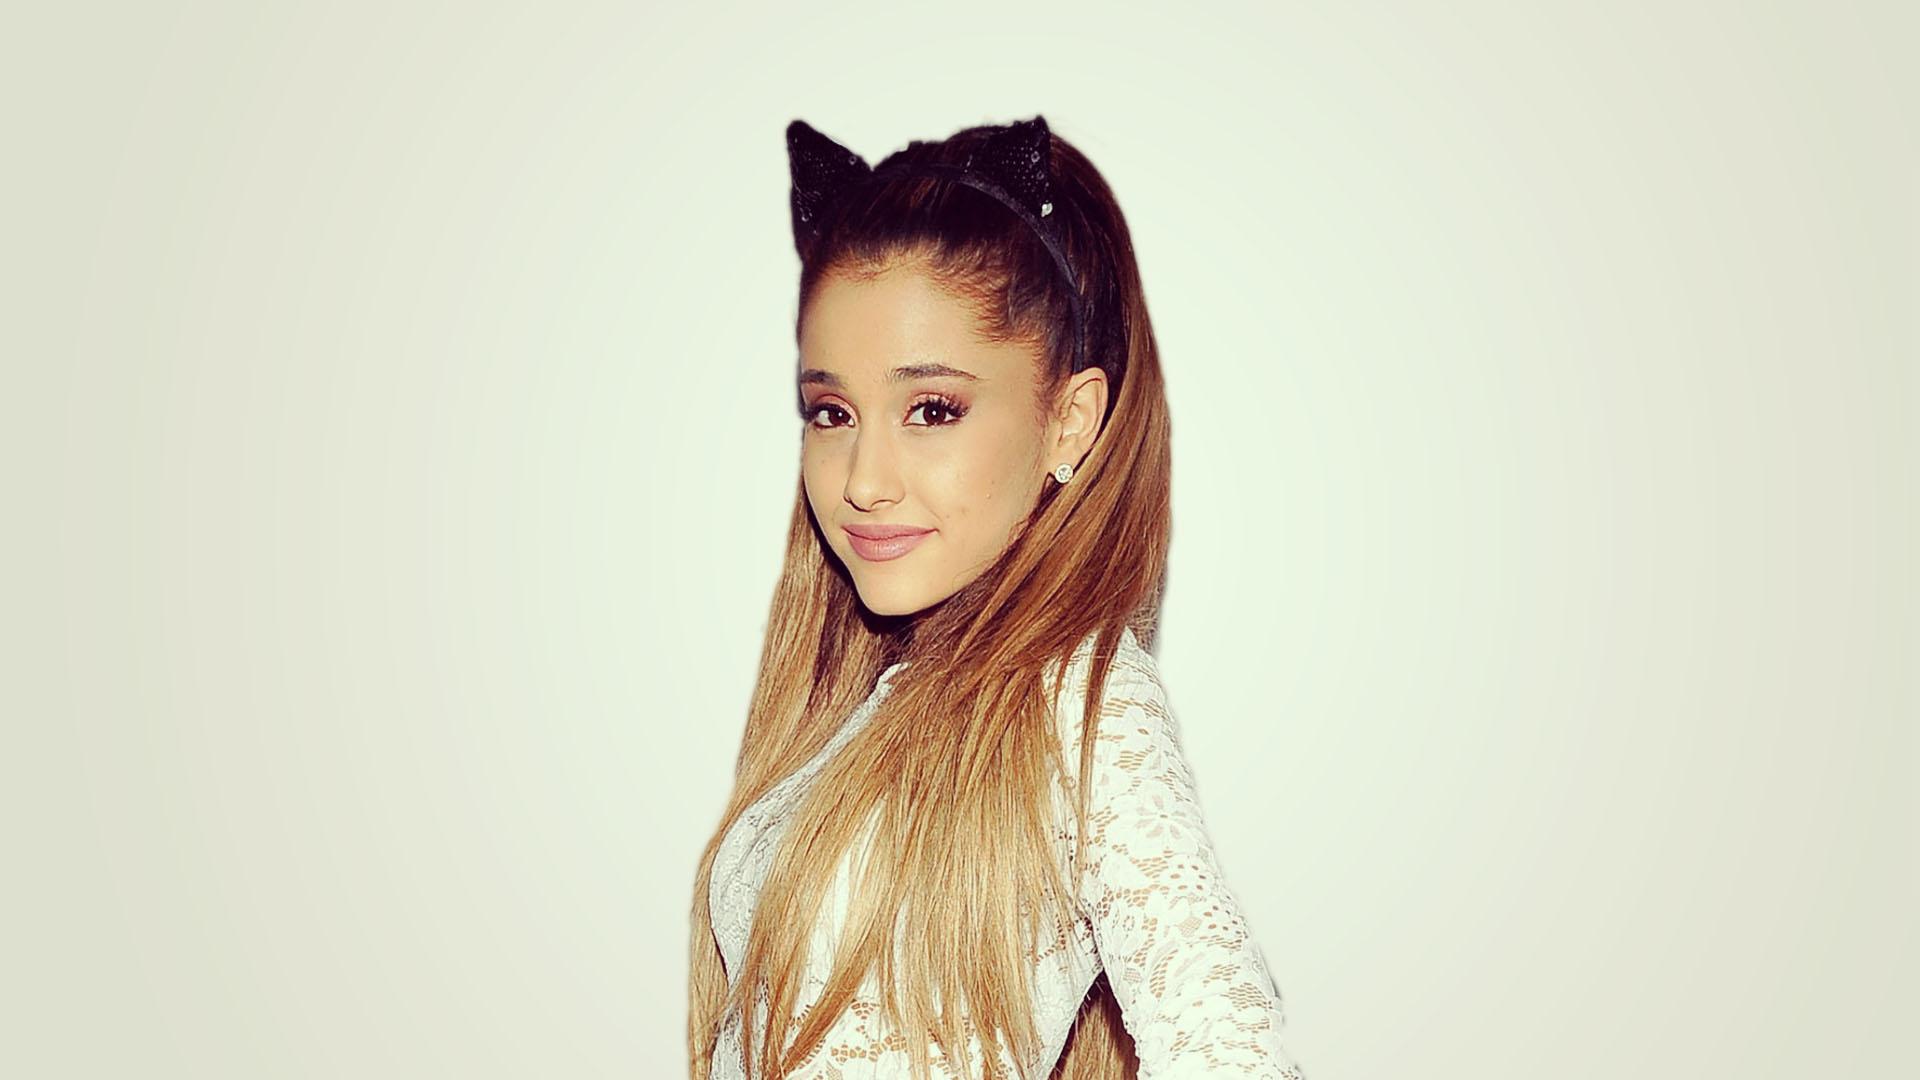 Ariana Grande 1080p Ariana Grande widescreen